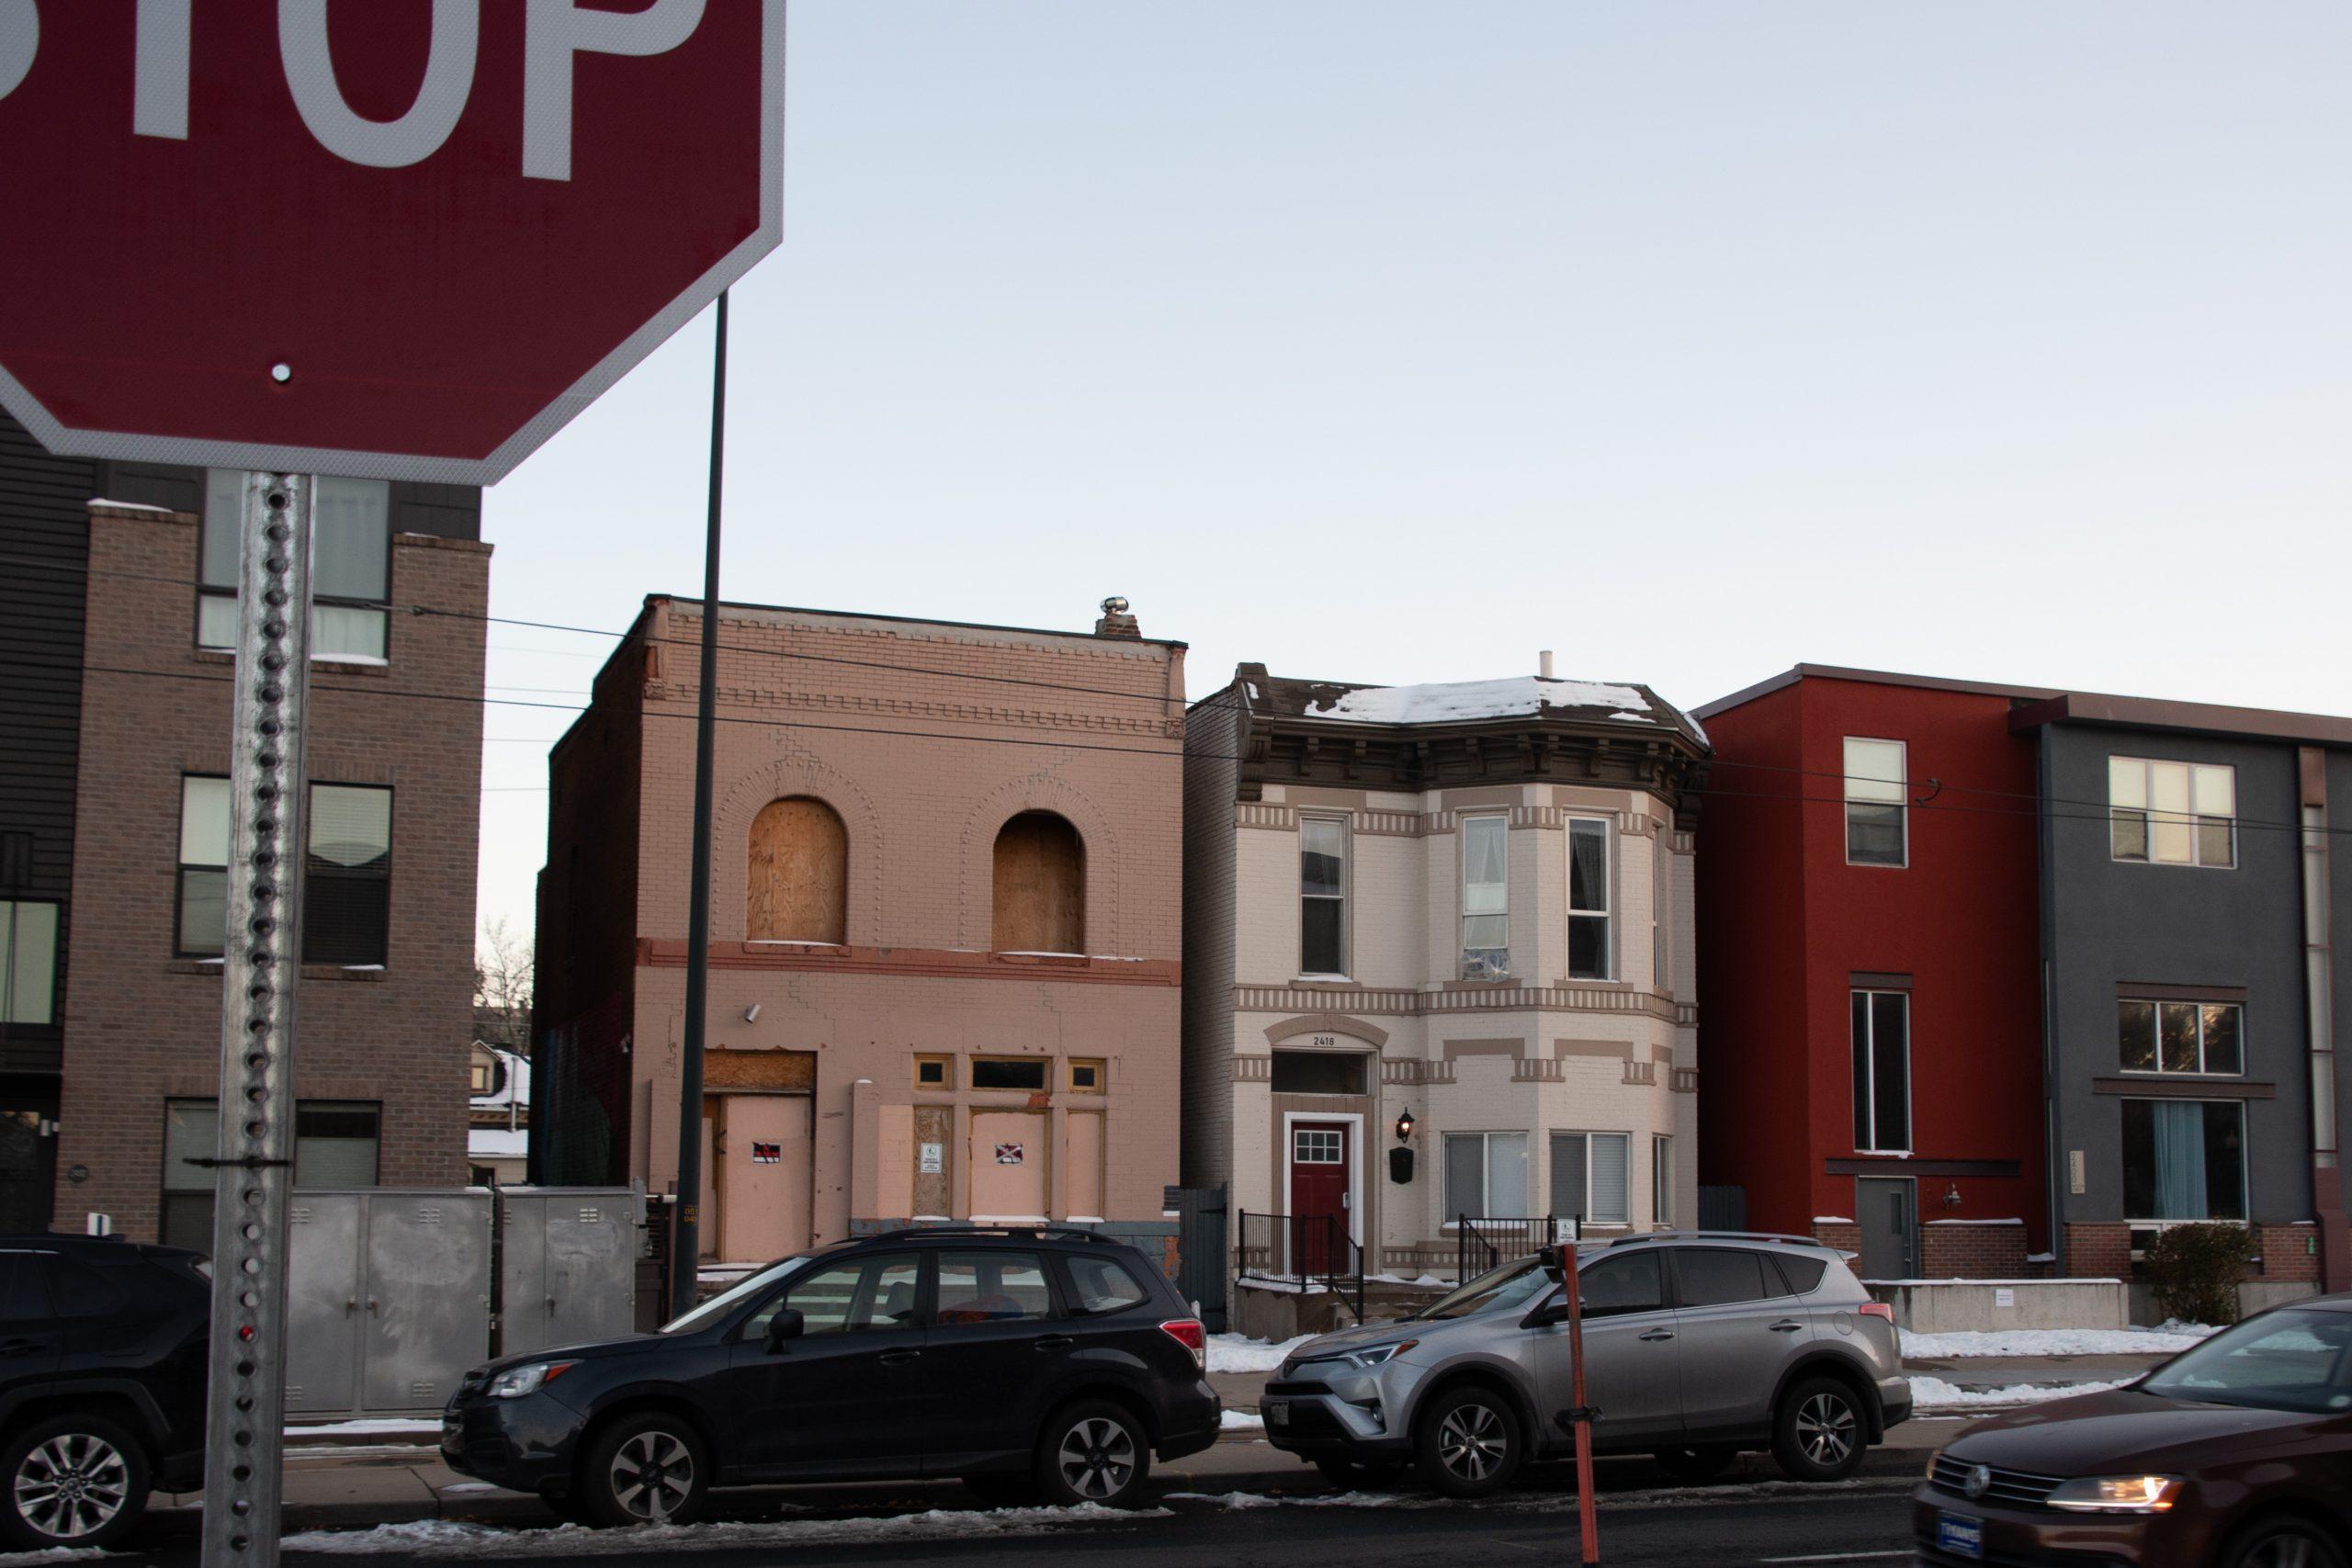 Thousands of Coloradans await rental assistance as eviction moratorium expiration looms